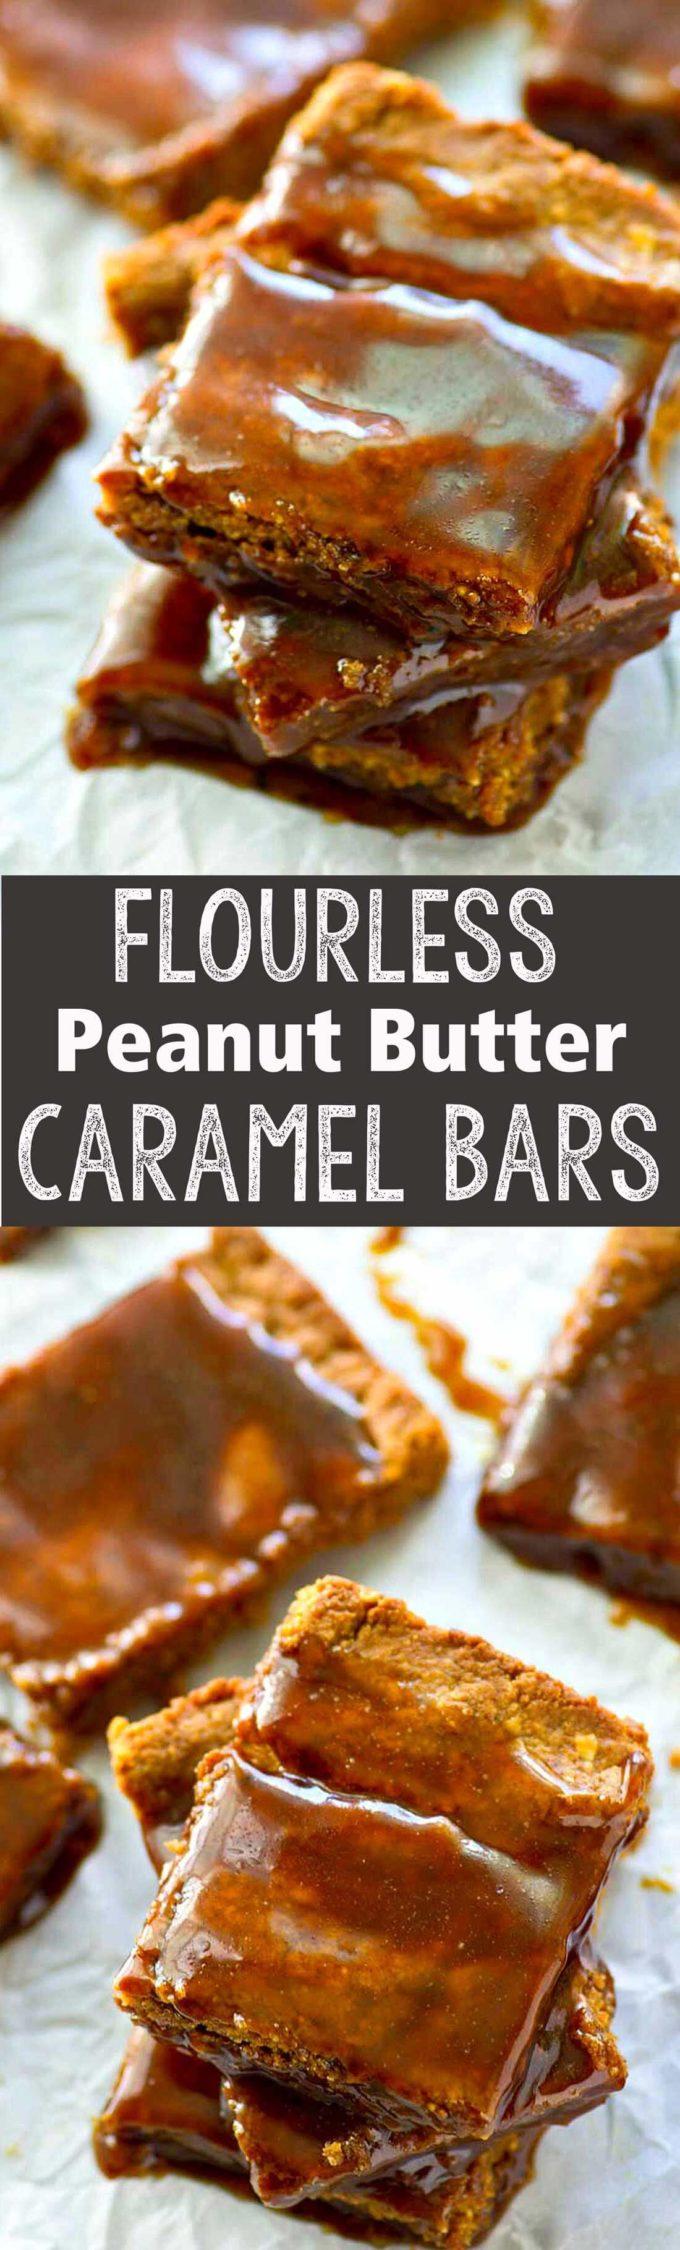 Flourless peanut butter caramel bars are the best tasting dessert ever ...